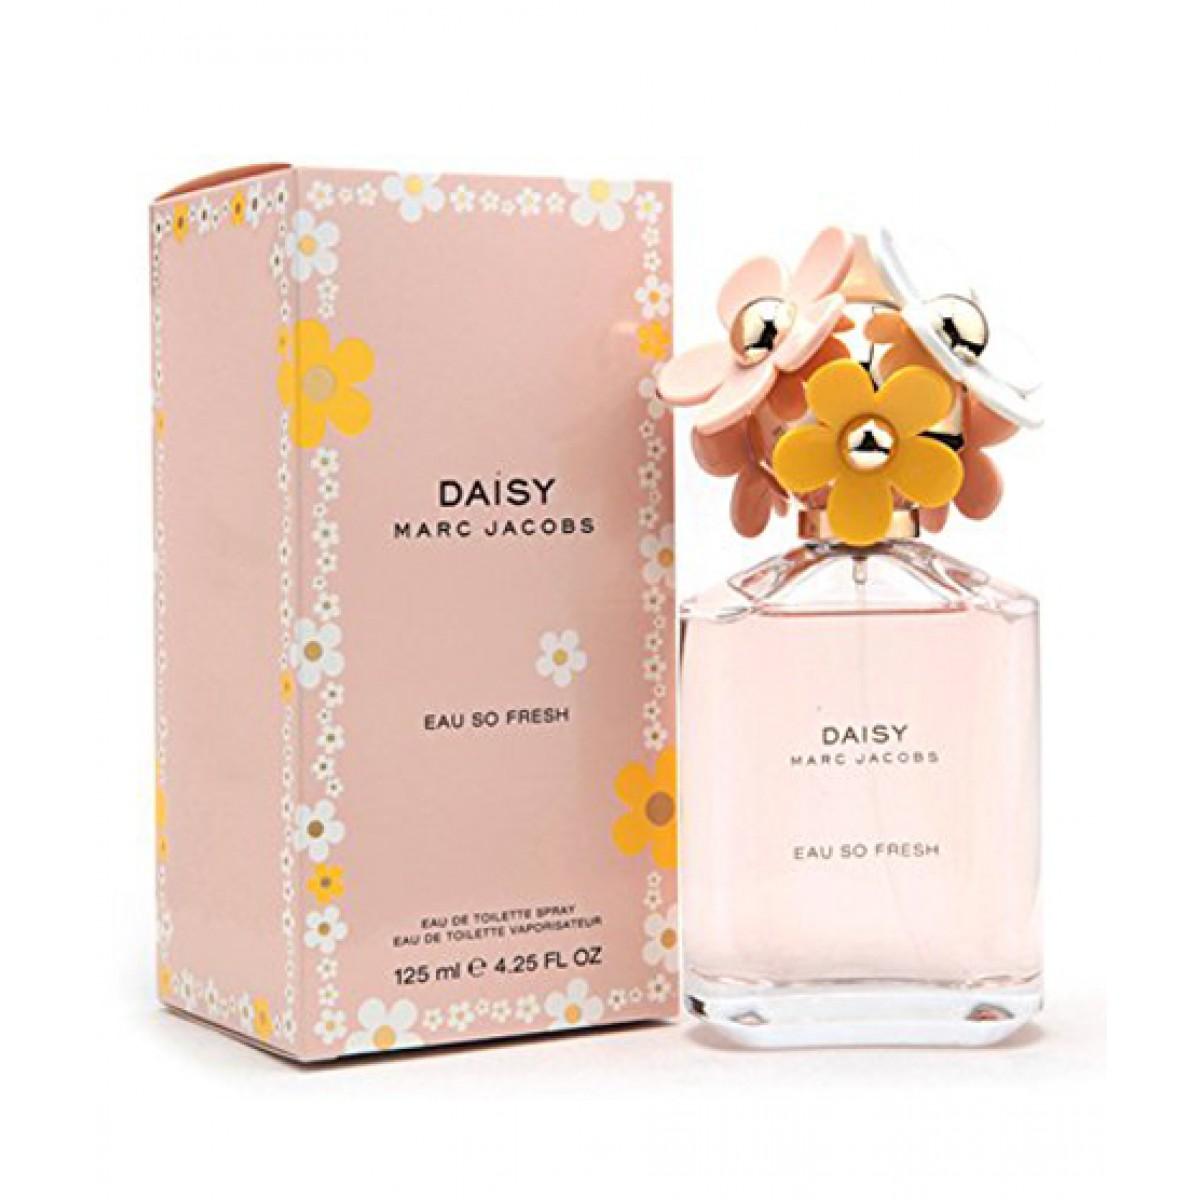 Marc Jacobs So Fresh Edt Perfume 125ml Price In Pakistan Buy Marc